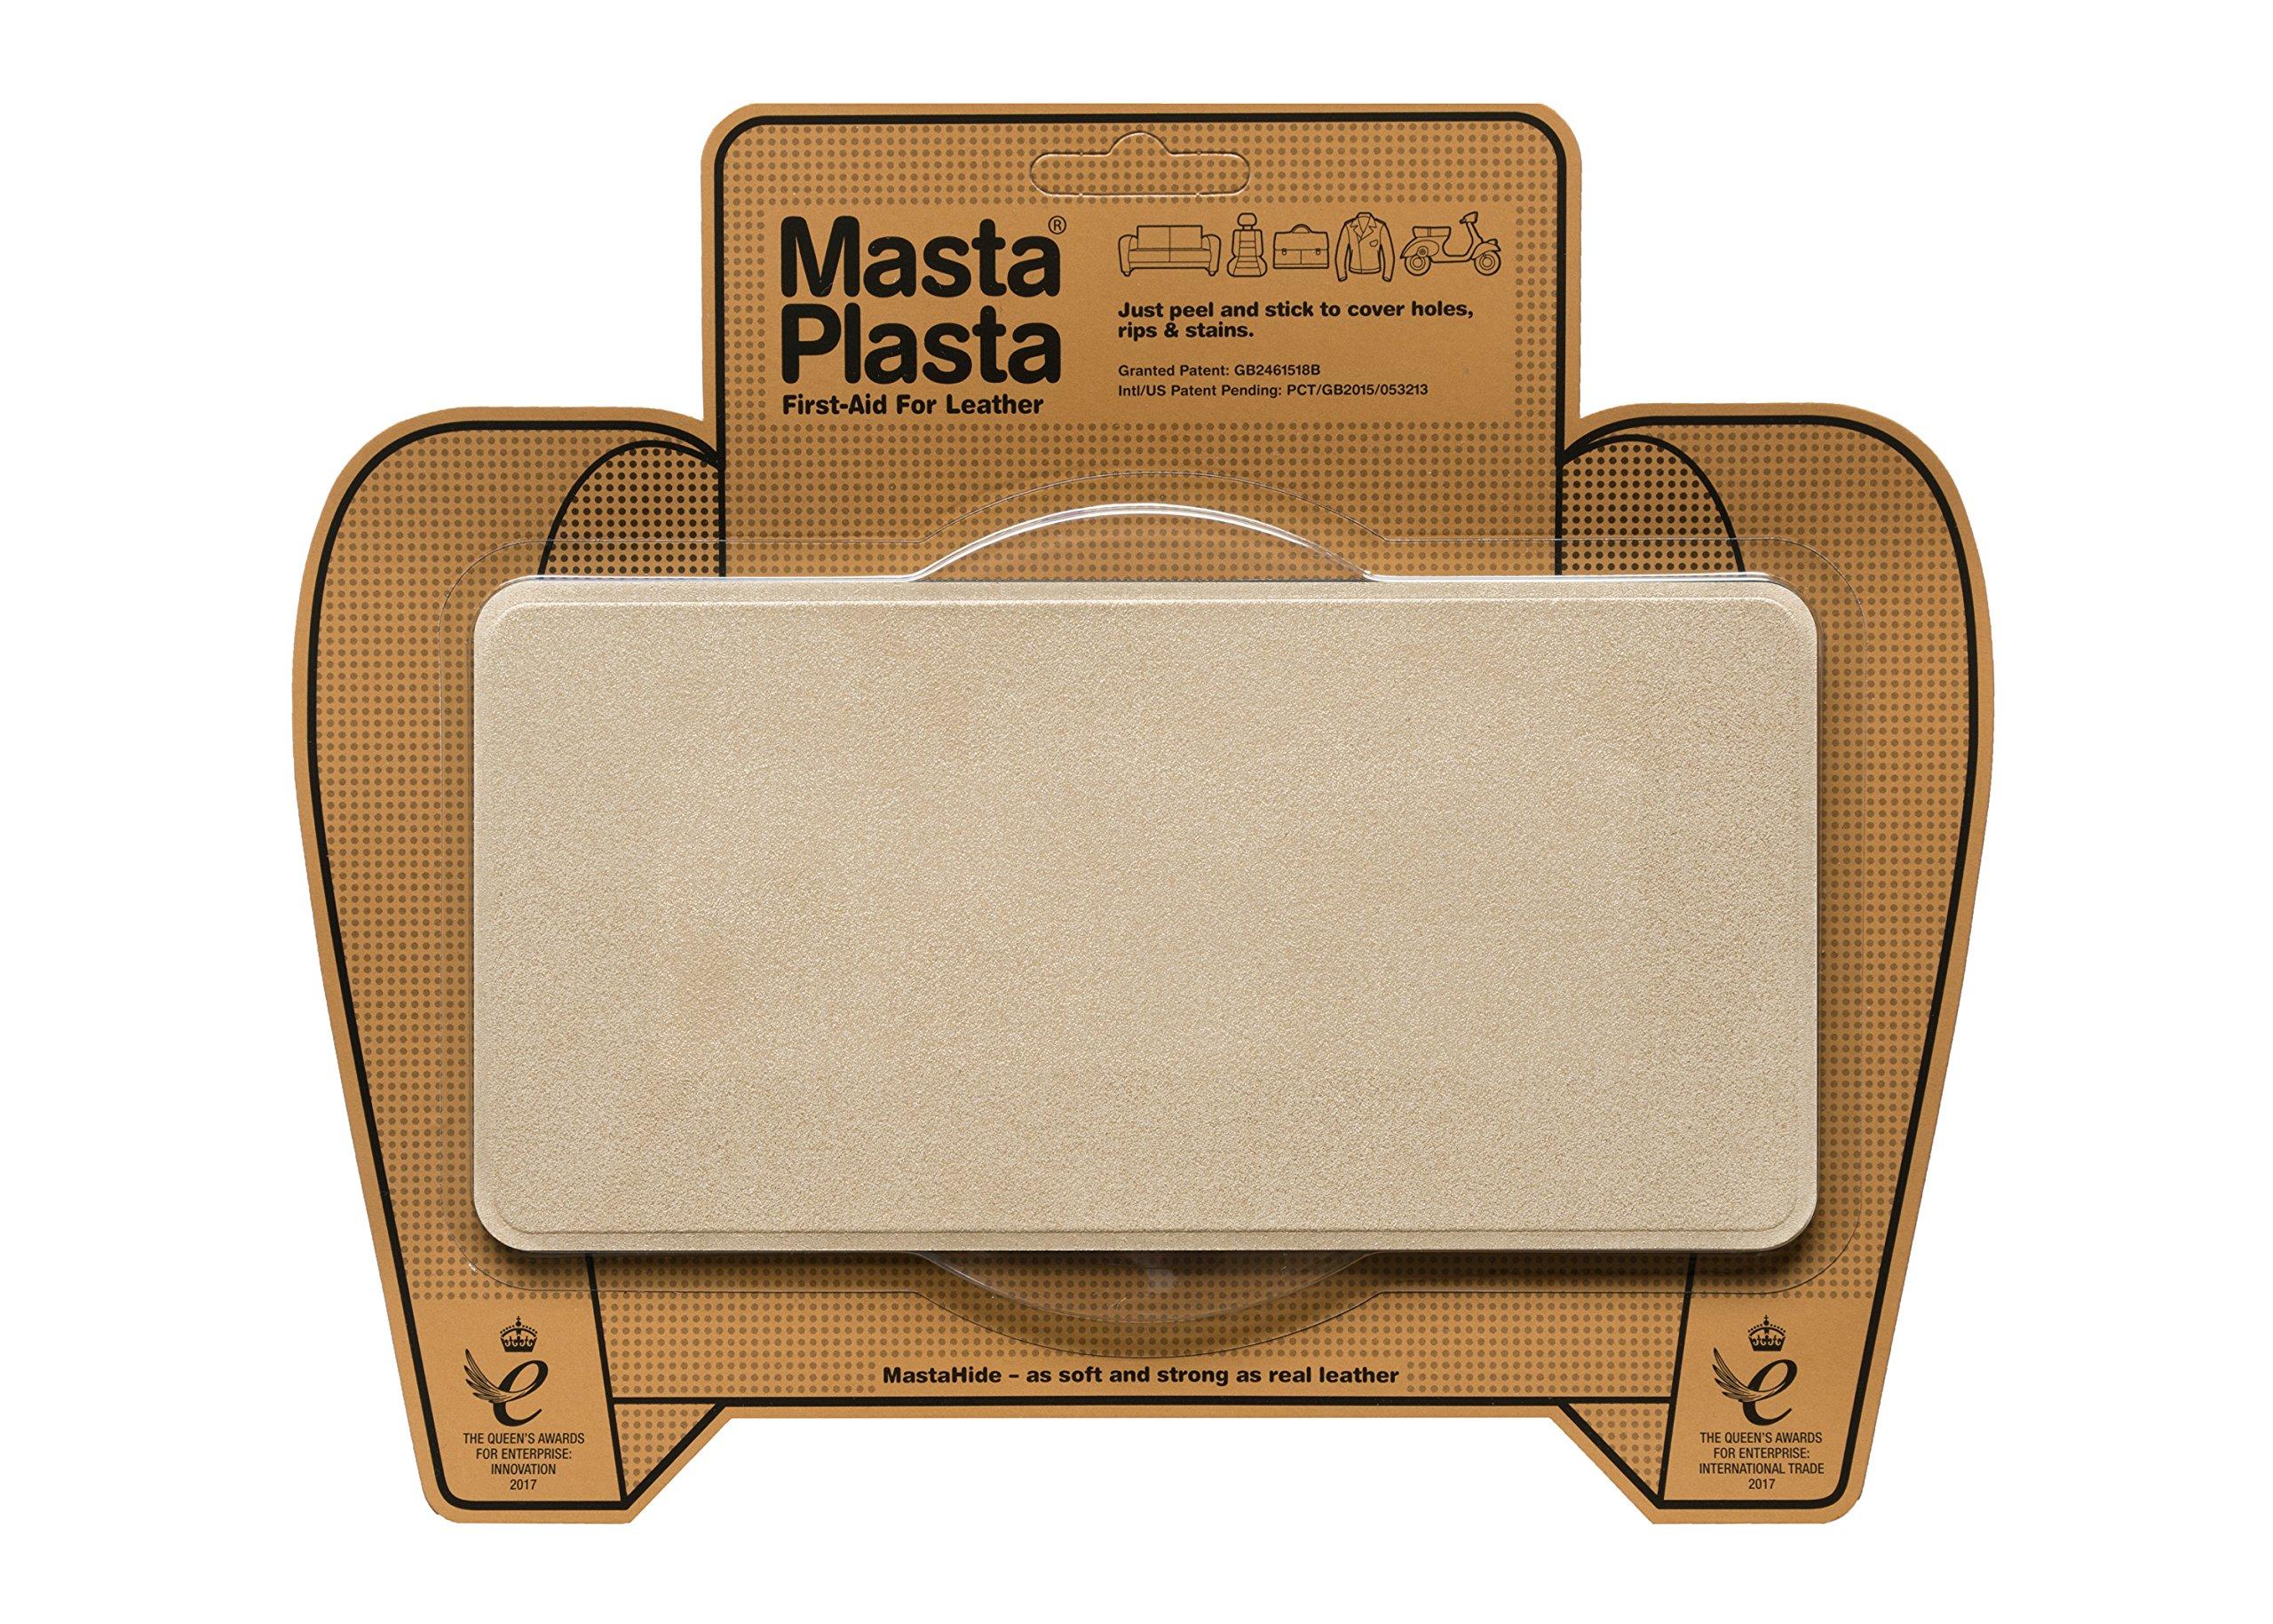 MastaPlasta Self-Adhesive Patch for Leather and Vinyl Repair, Large, Suede, Beige - 8 x 4 Inch by MASTAPLASTA